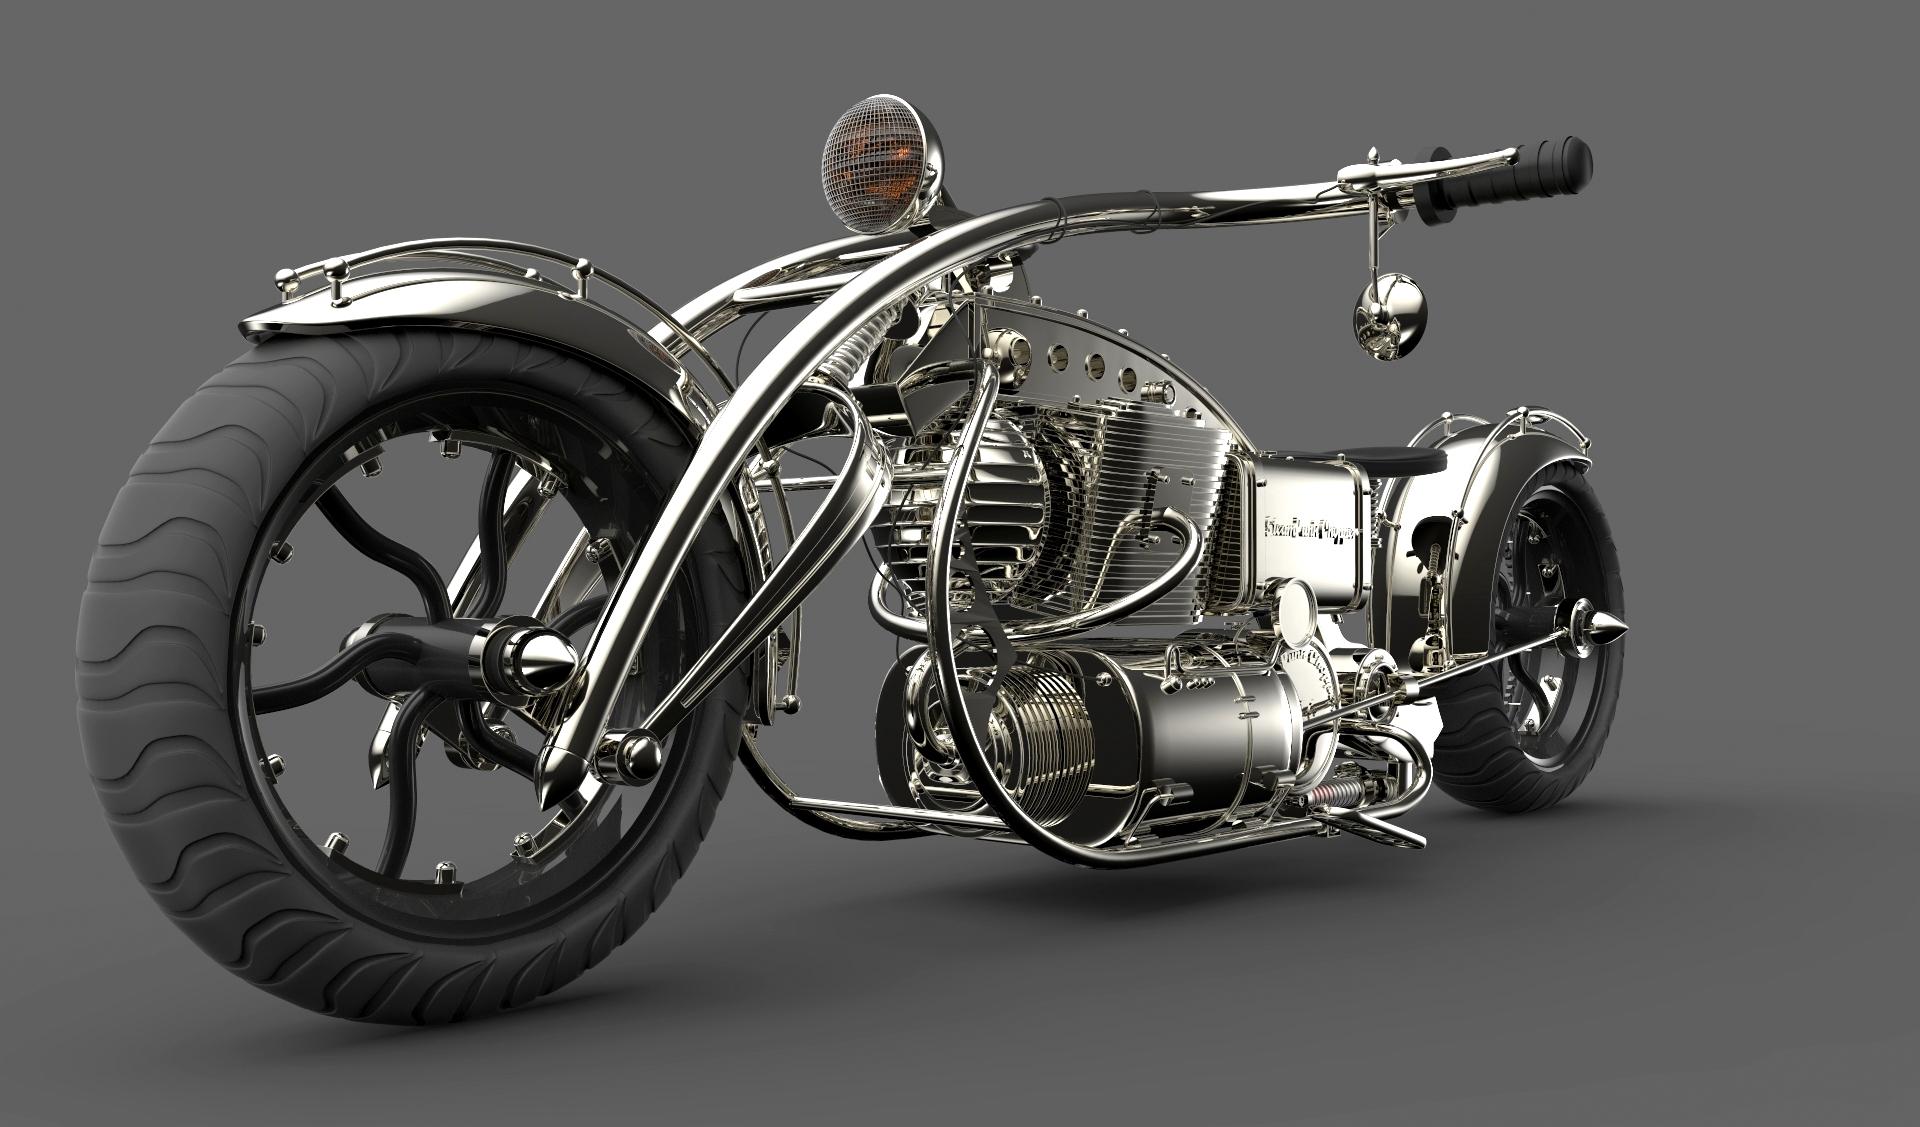 Motocicleta Chopper by juliopires3d